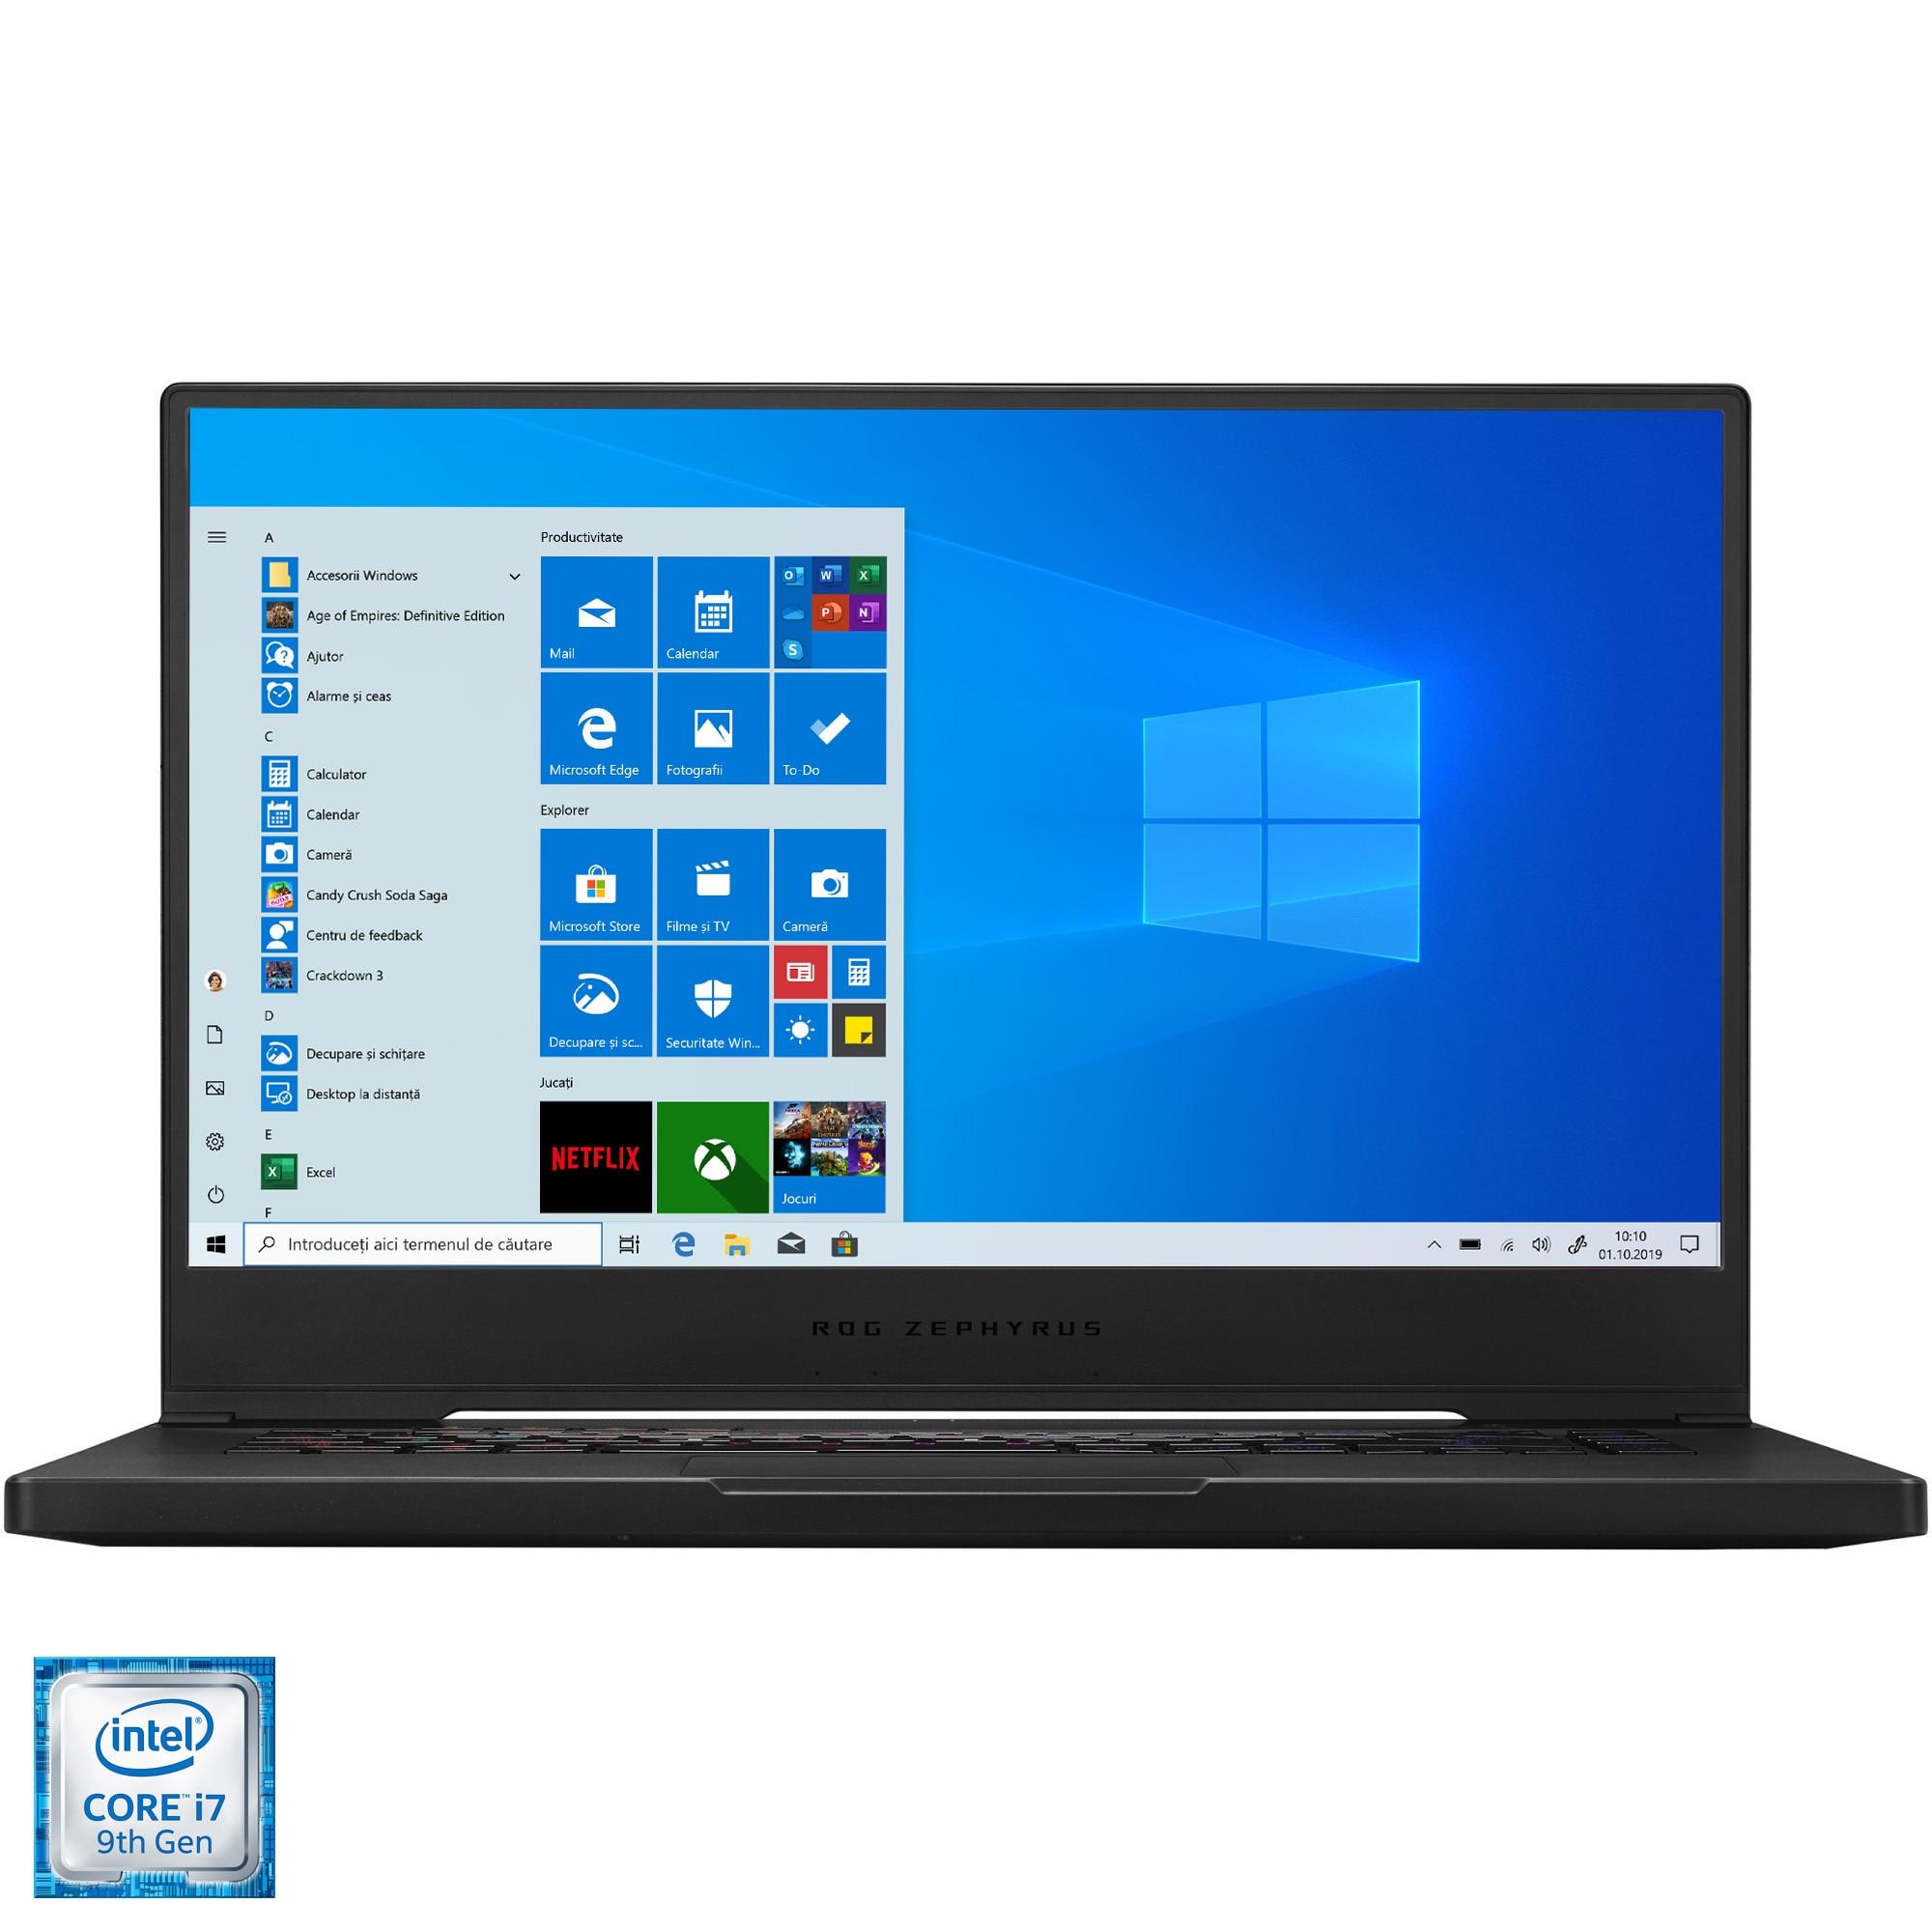 "Fotografie Laptop Gaming ASUS ROG Zephyrus M GU502GV cu procesor Intel® Core™ i7-9750H pana la 4.50 GHz Coffee Lake, 15.6"", Full HD, IPS, 240Hz, 16GB, 512GB SSD, NVIDIA® GeForce RTX™ 2060 6GB, Windows 10, Brushed Black"